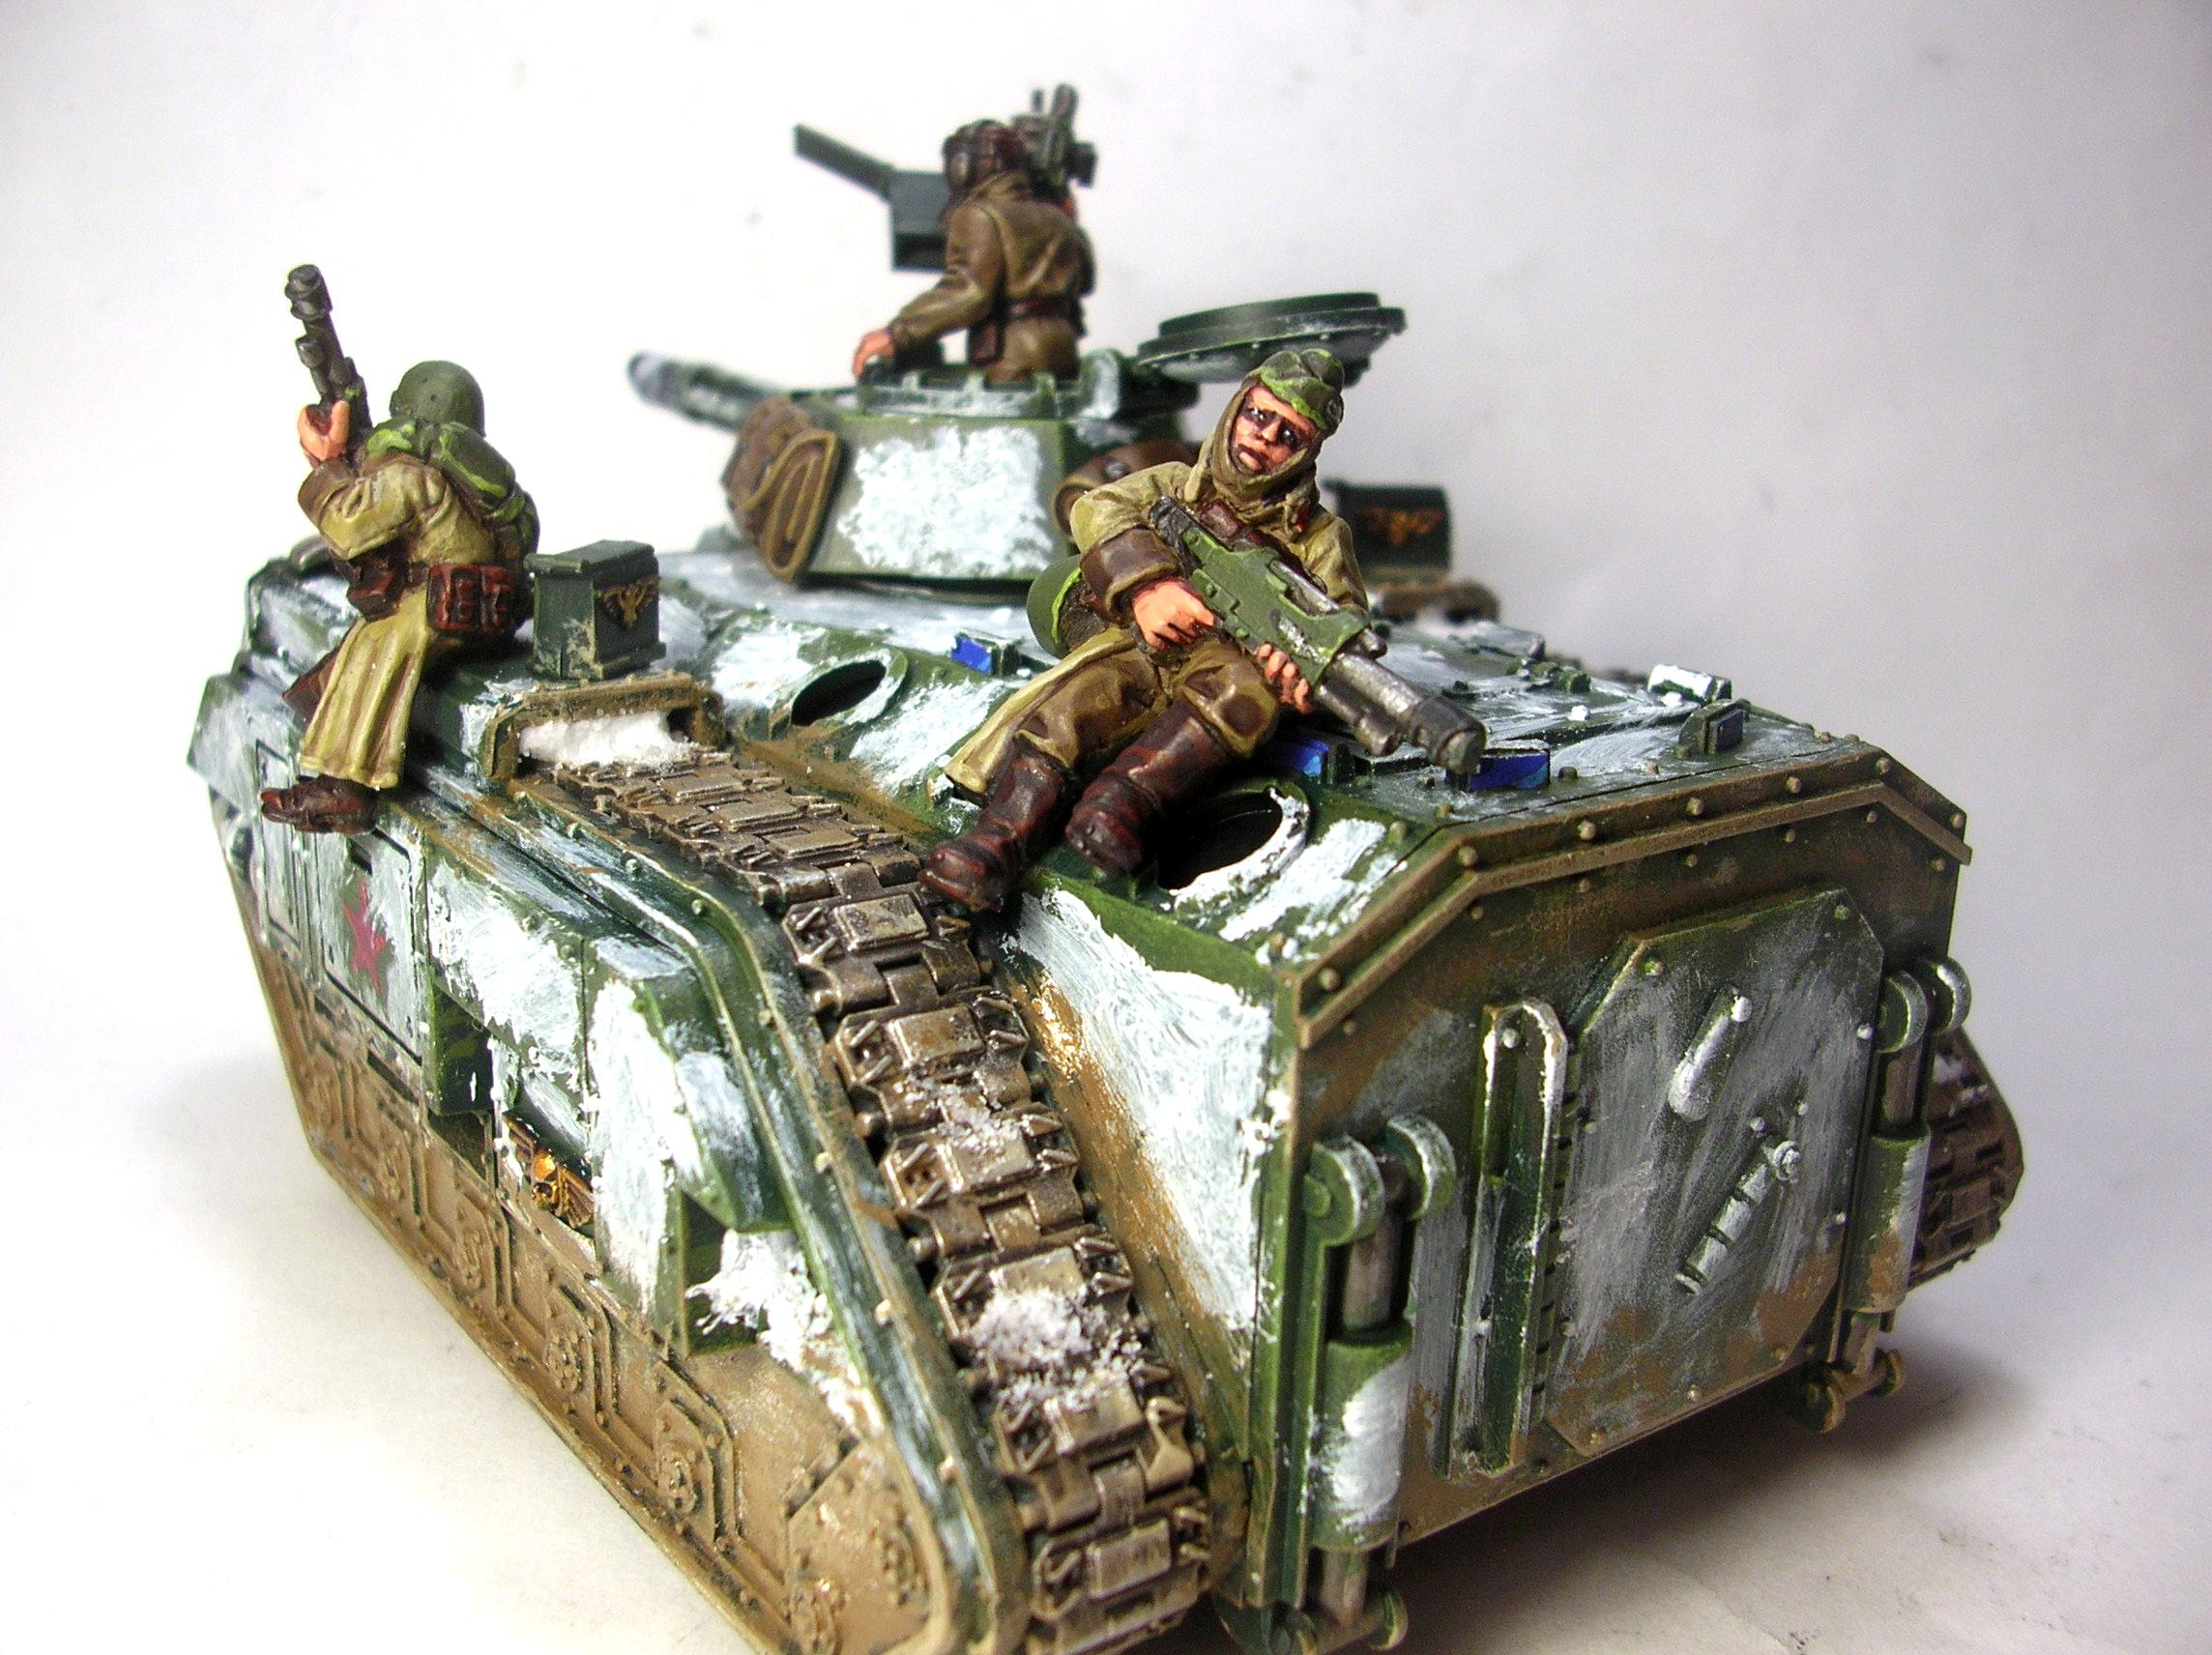 Chimera, Imperial Guard, Russians, Valhallans, Warhammer 40,000, Winter